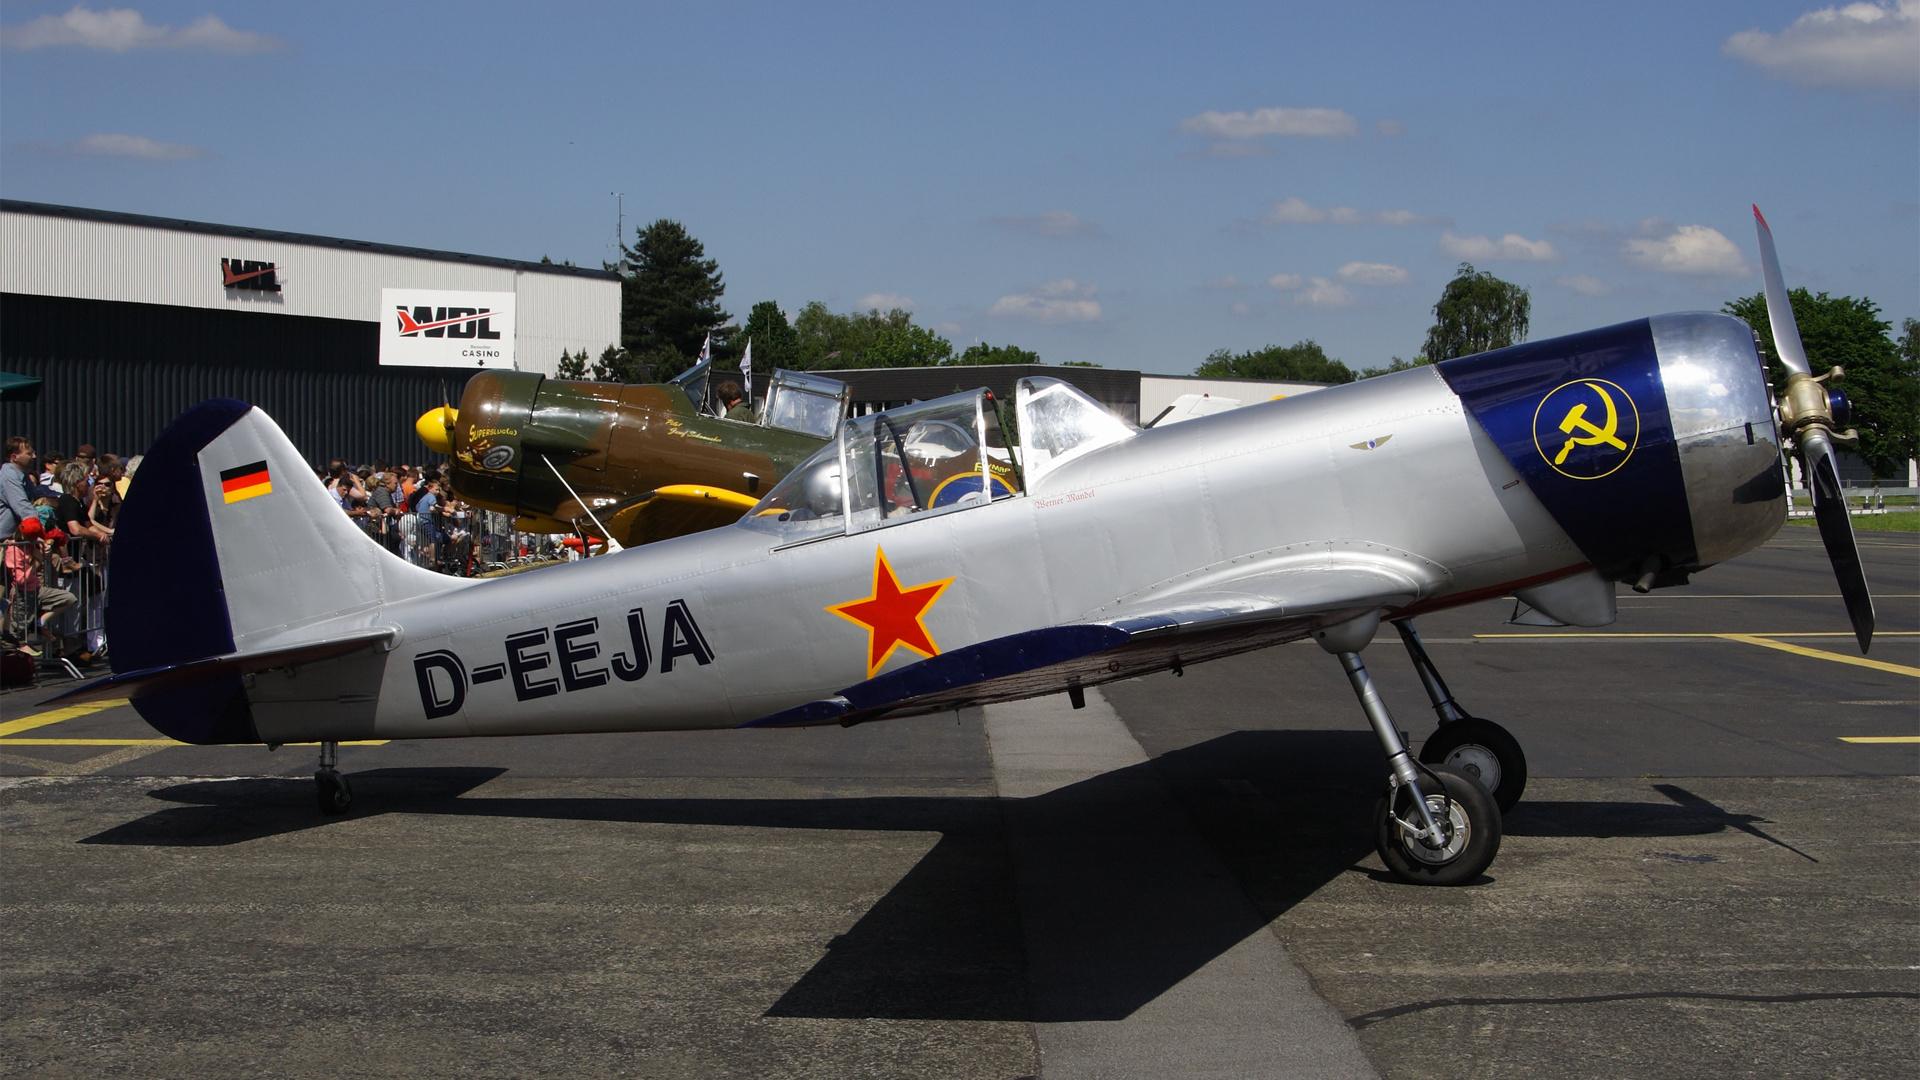 D-EEJA-1 YAK50 ESS 200806